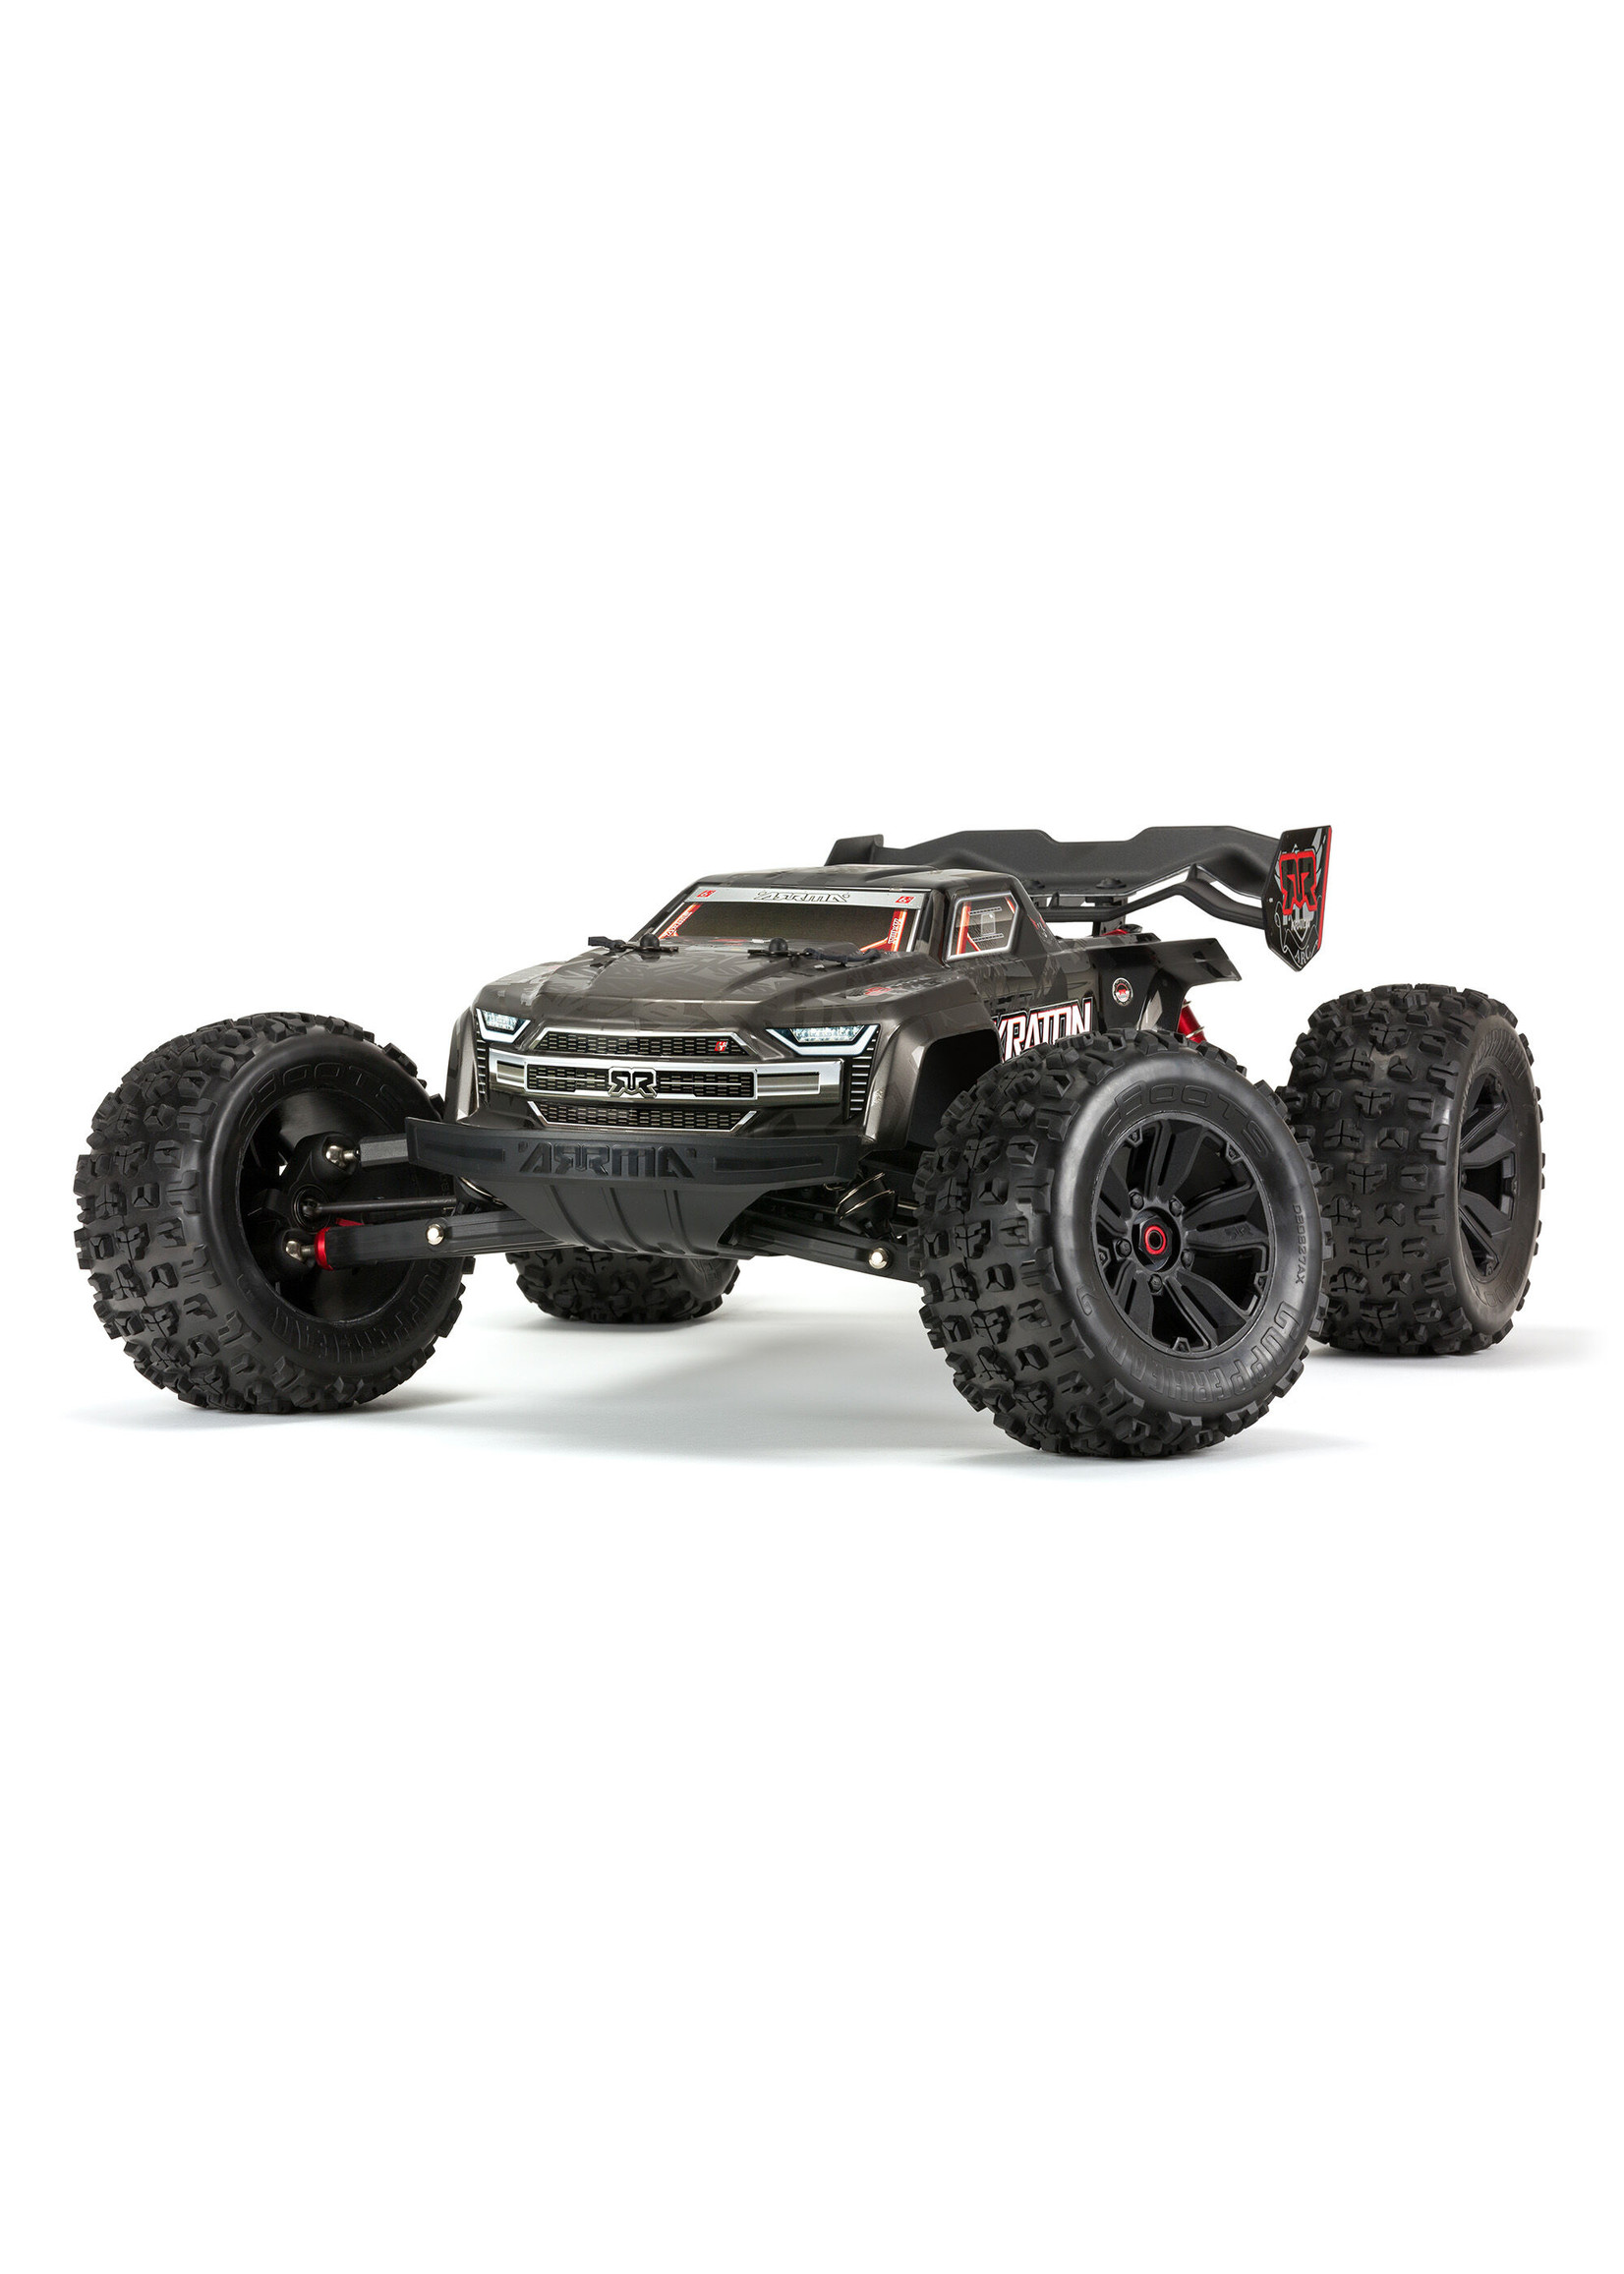 ARRMA ARA106053 Arrma Kraton 1/8 4WD EXtreme Bash Roller Speed Black